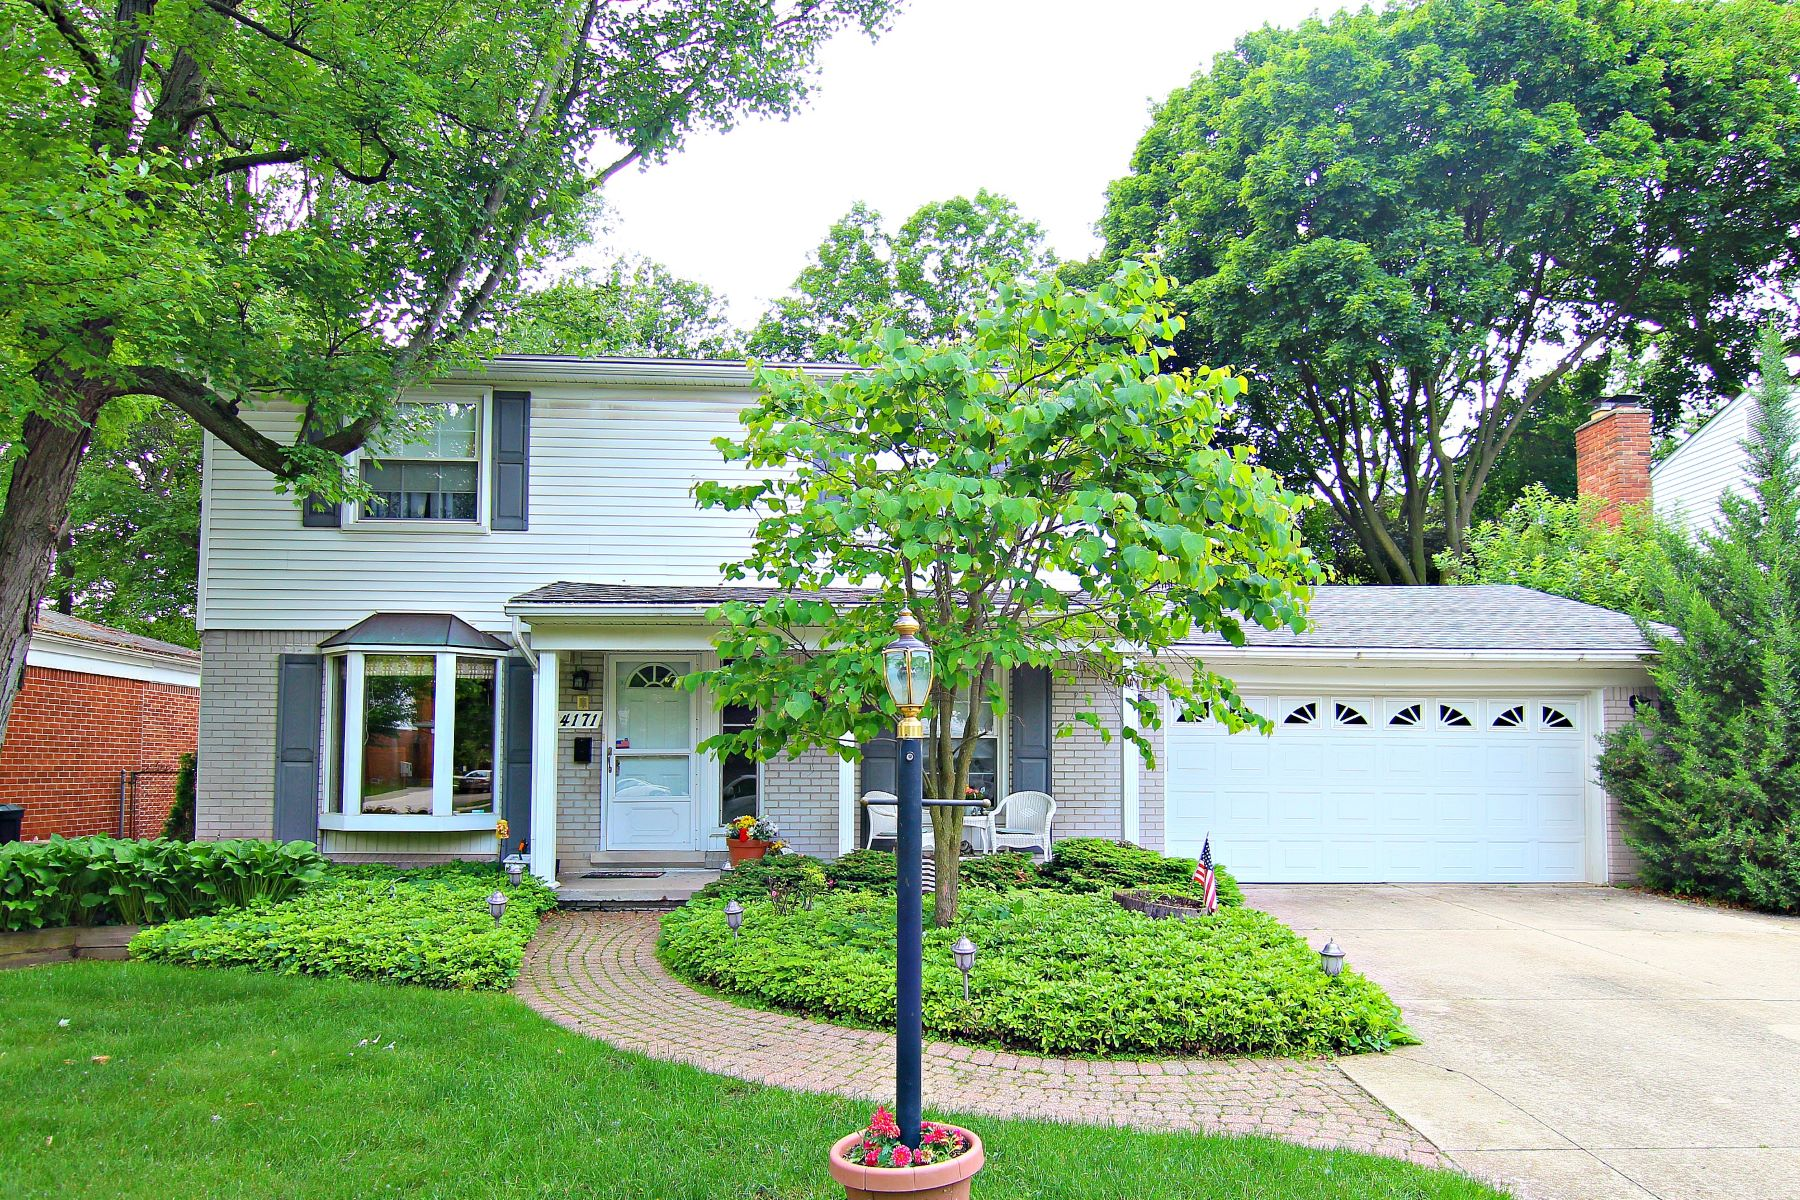 Single Family Homes for Sale at 14171 Ingram St. 14171 Ingram Street Livonia, Michigan 48154 United States